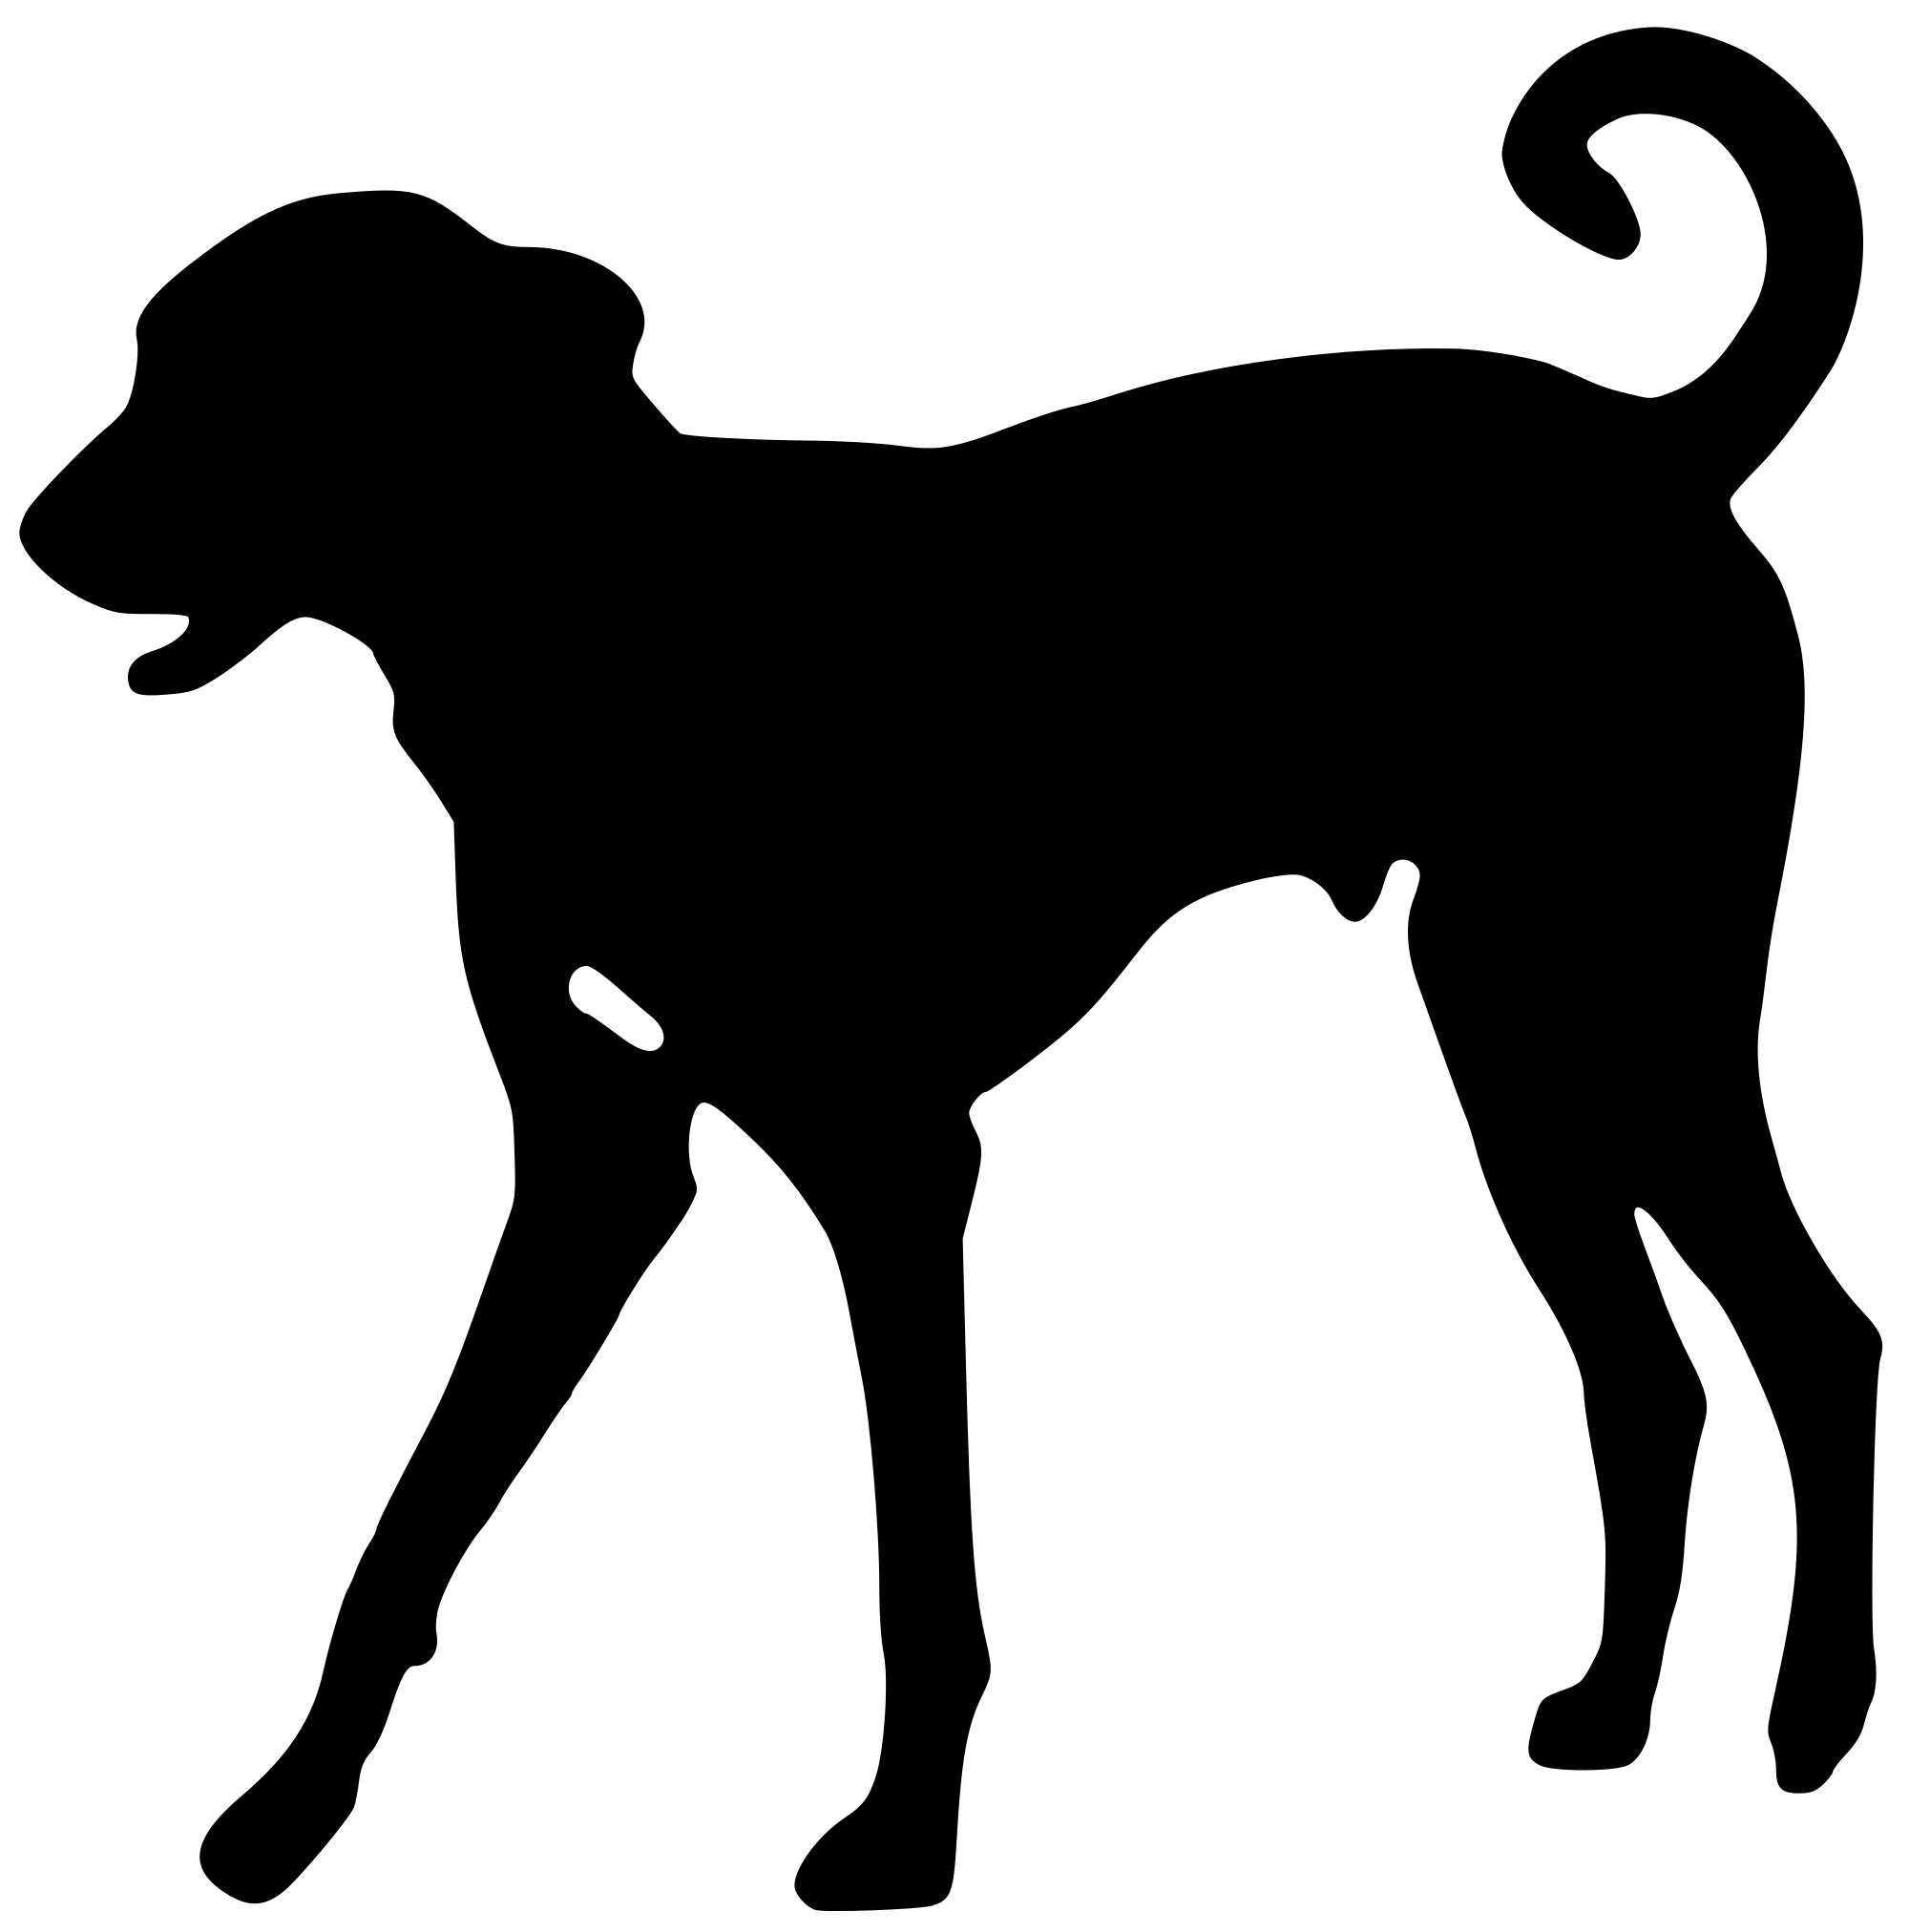 2000x2024 Filedog Silhouette 01.svg